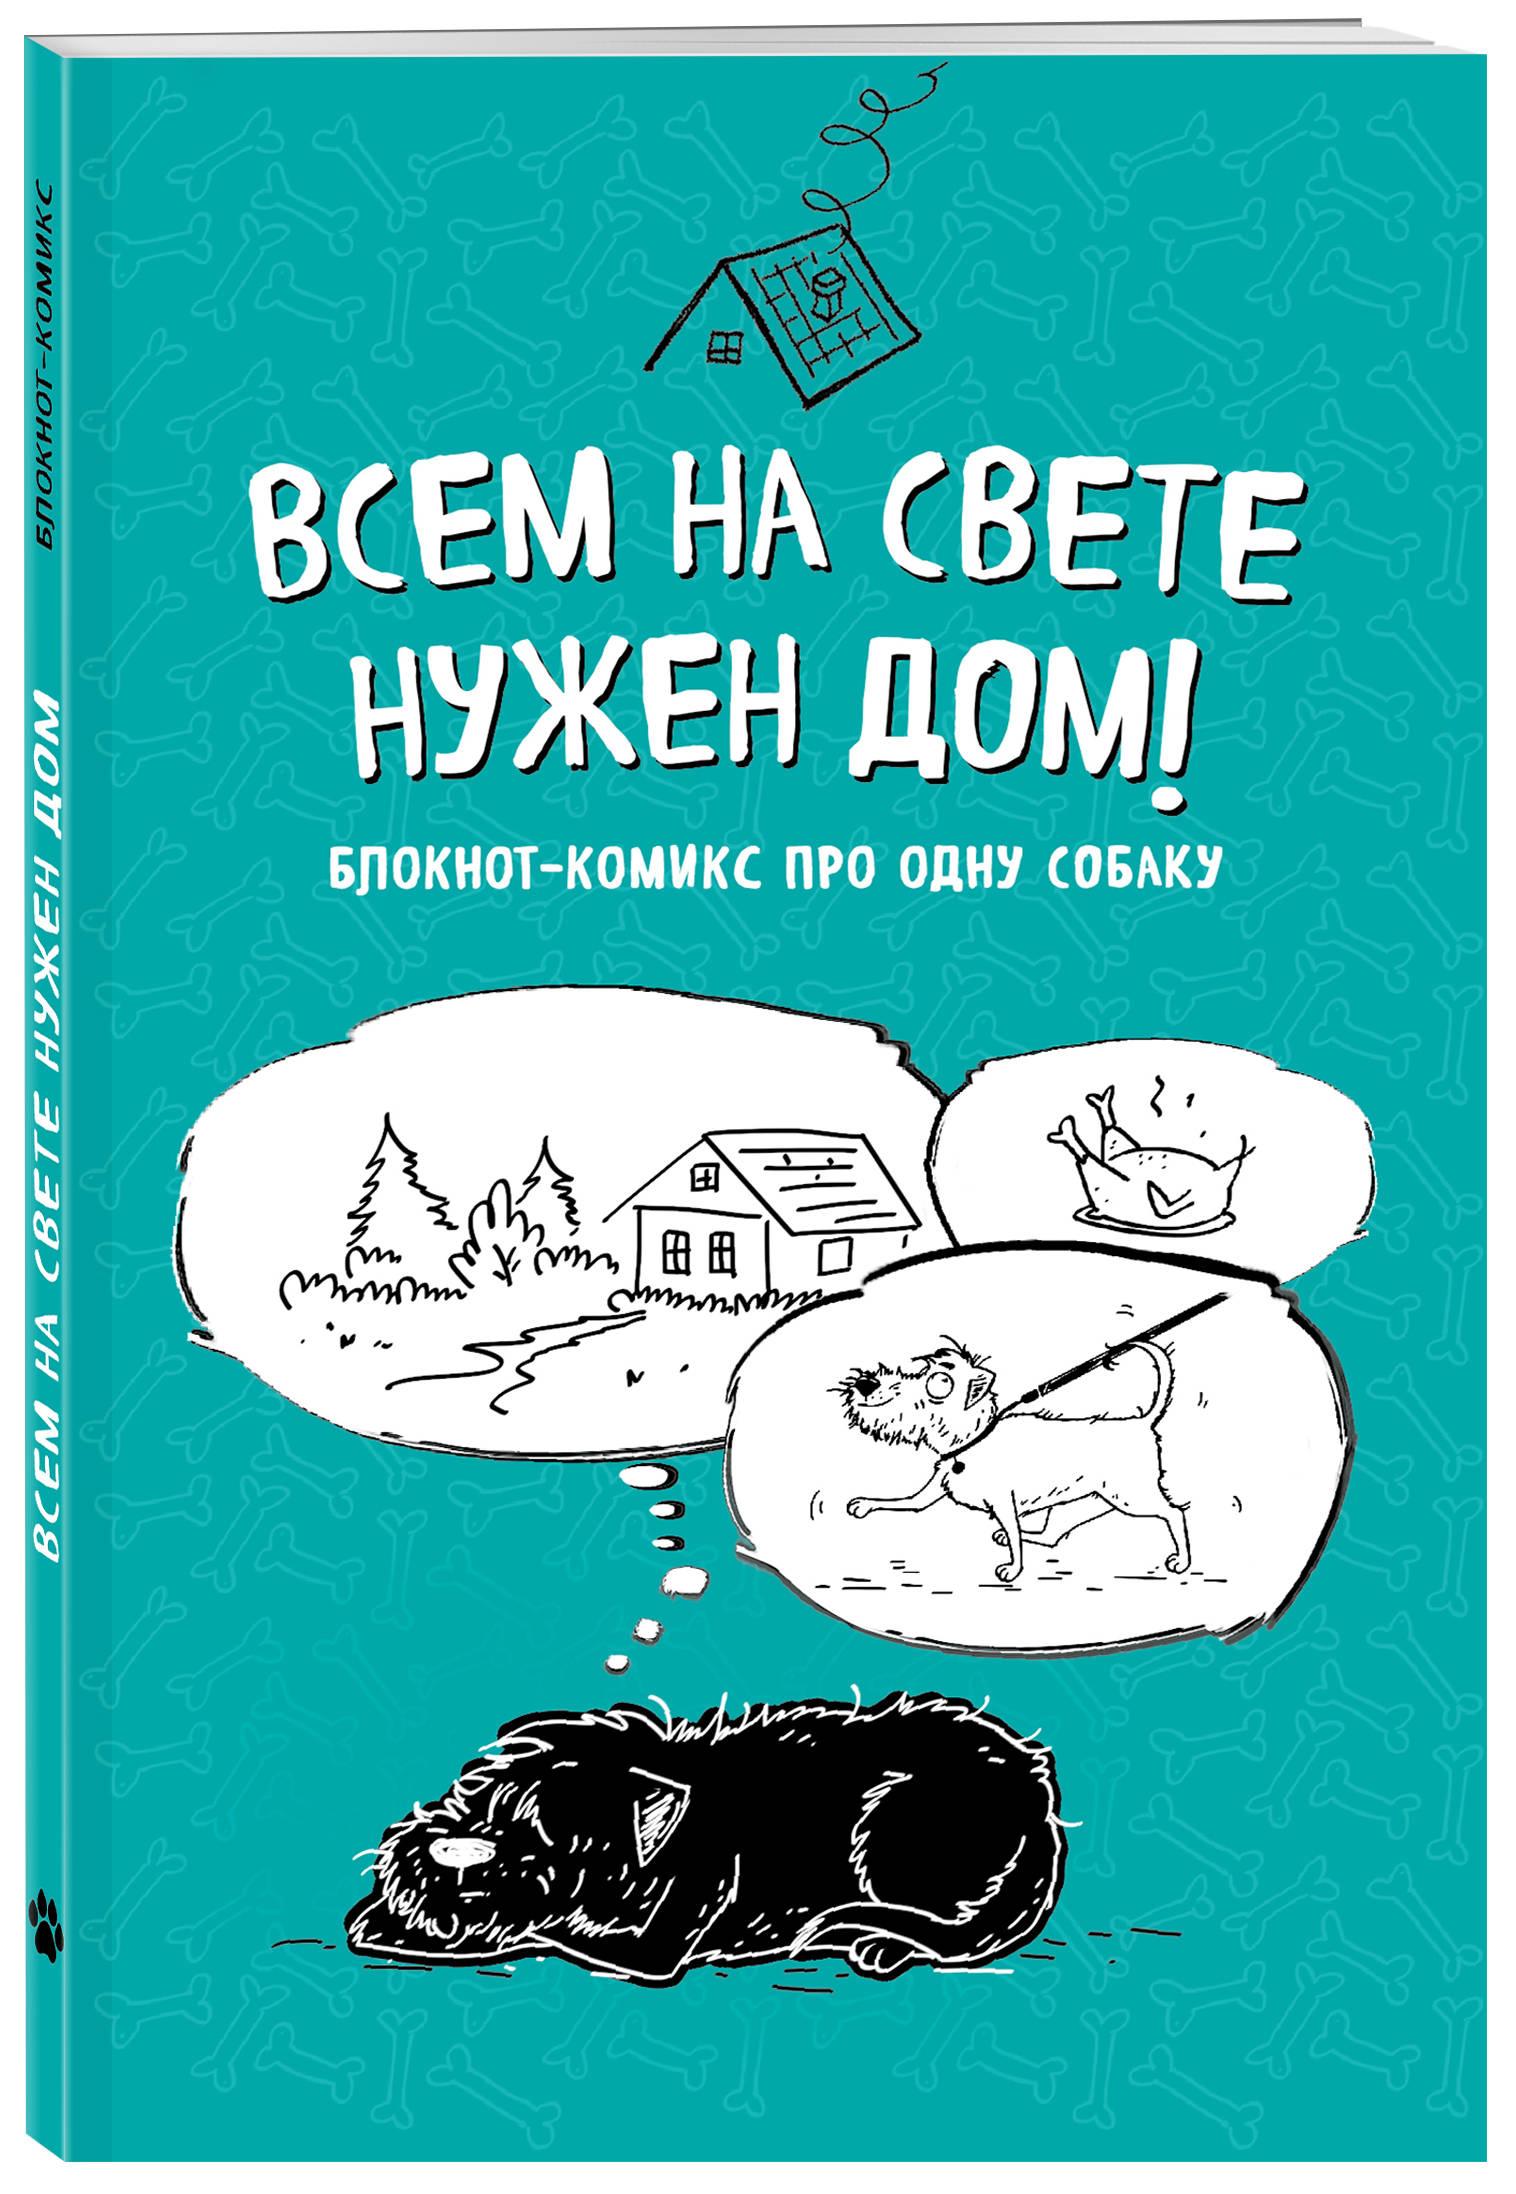 Блокнот-комикс про одну собаку. Всем на свете нужен дом! ( Bird Born  )